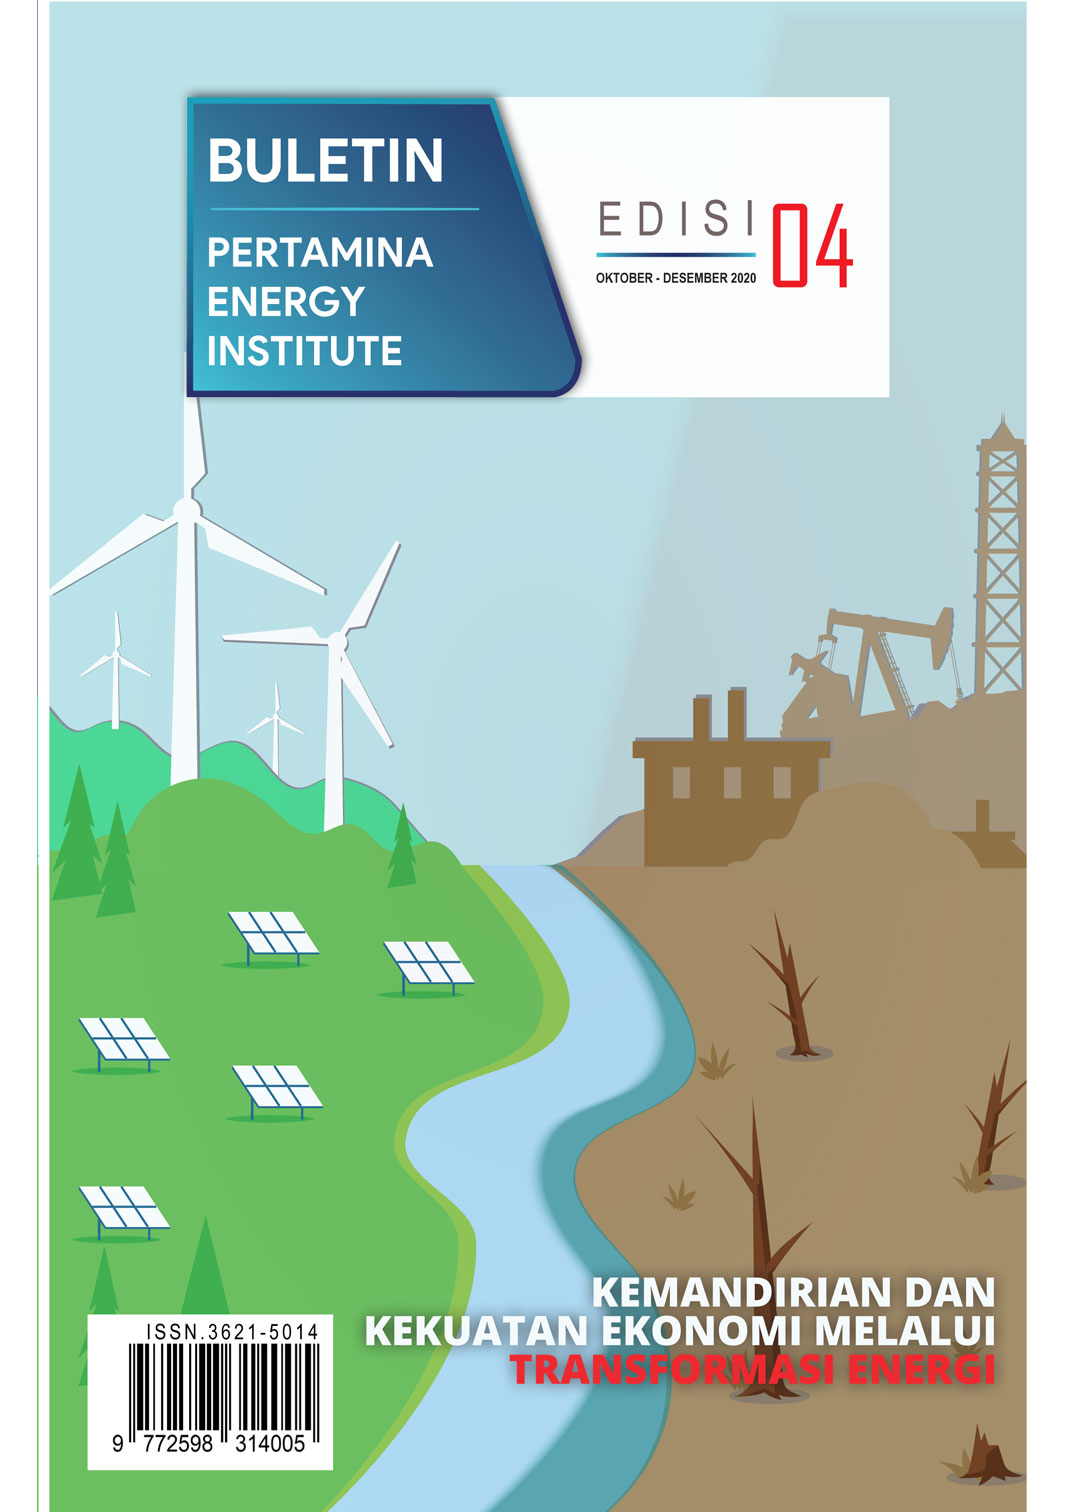 Pertamina Energy Institute - Edisi 04 (Oktober - Desember 2020)